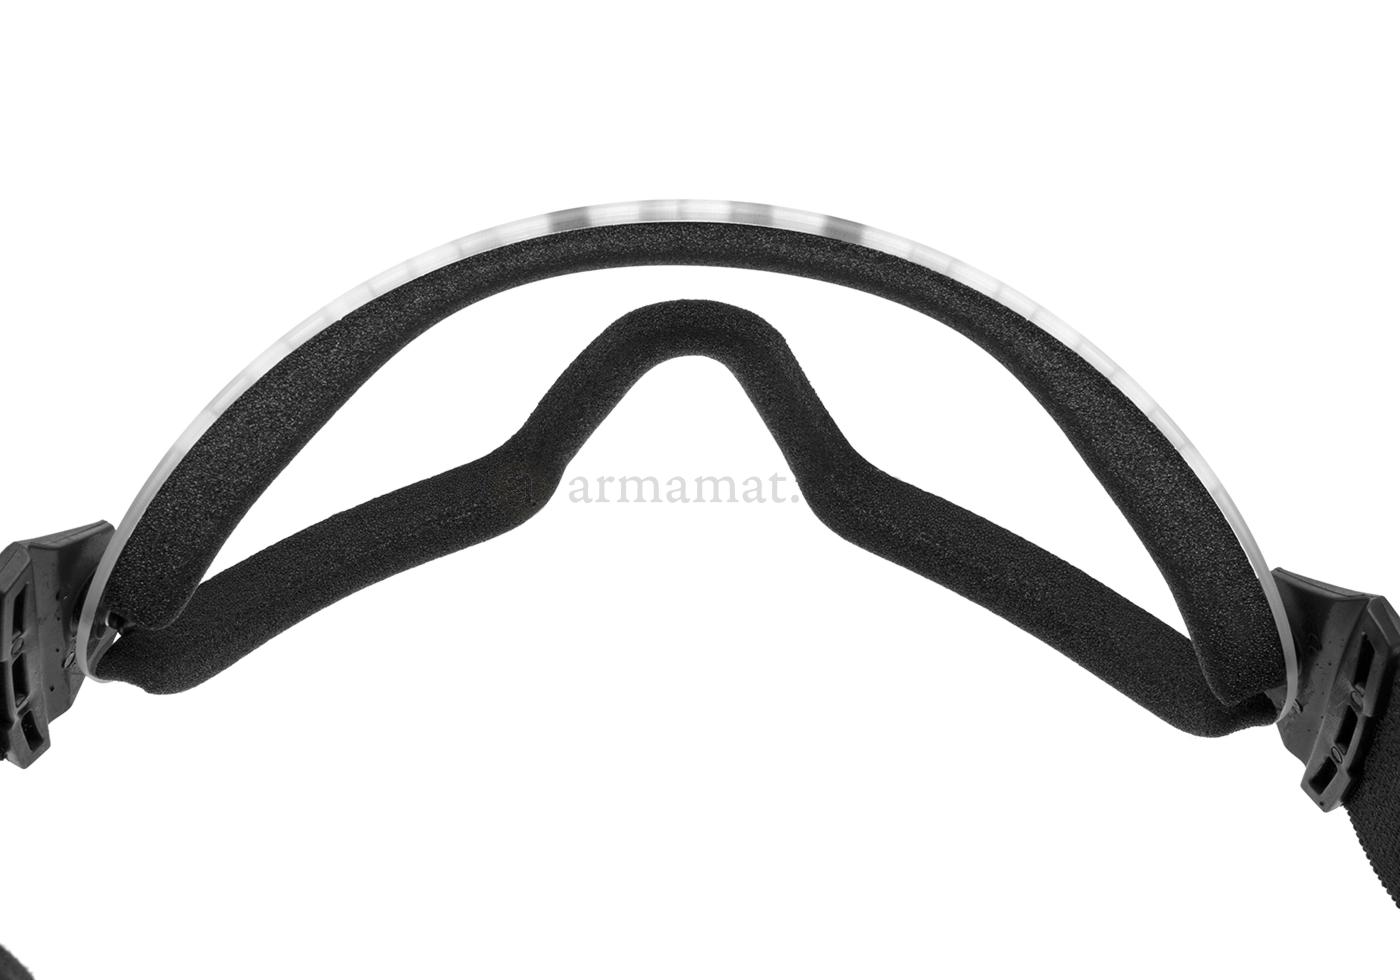 05ffeda8d901c Boogie SOEP Clear Black (Smith Optics) - Goggles - Brillen -  Schutzausrüstung - armamat.com Onlineshop